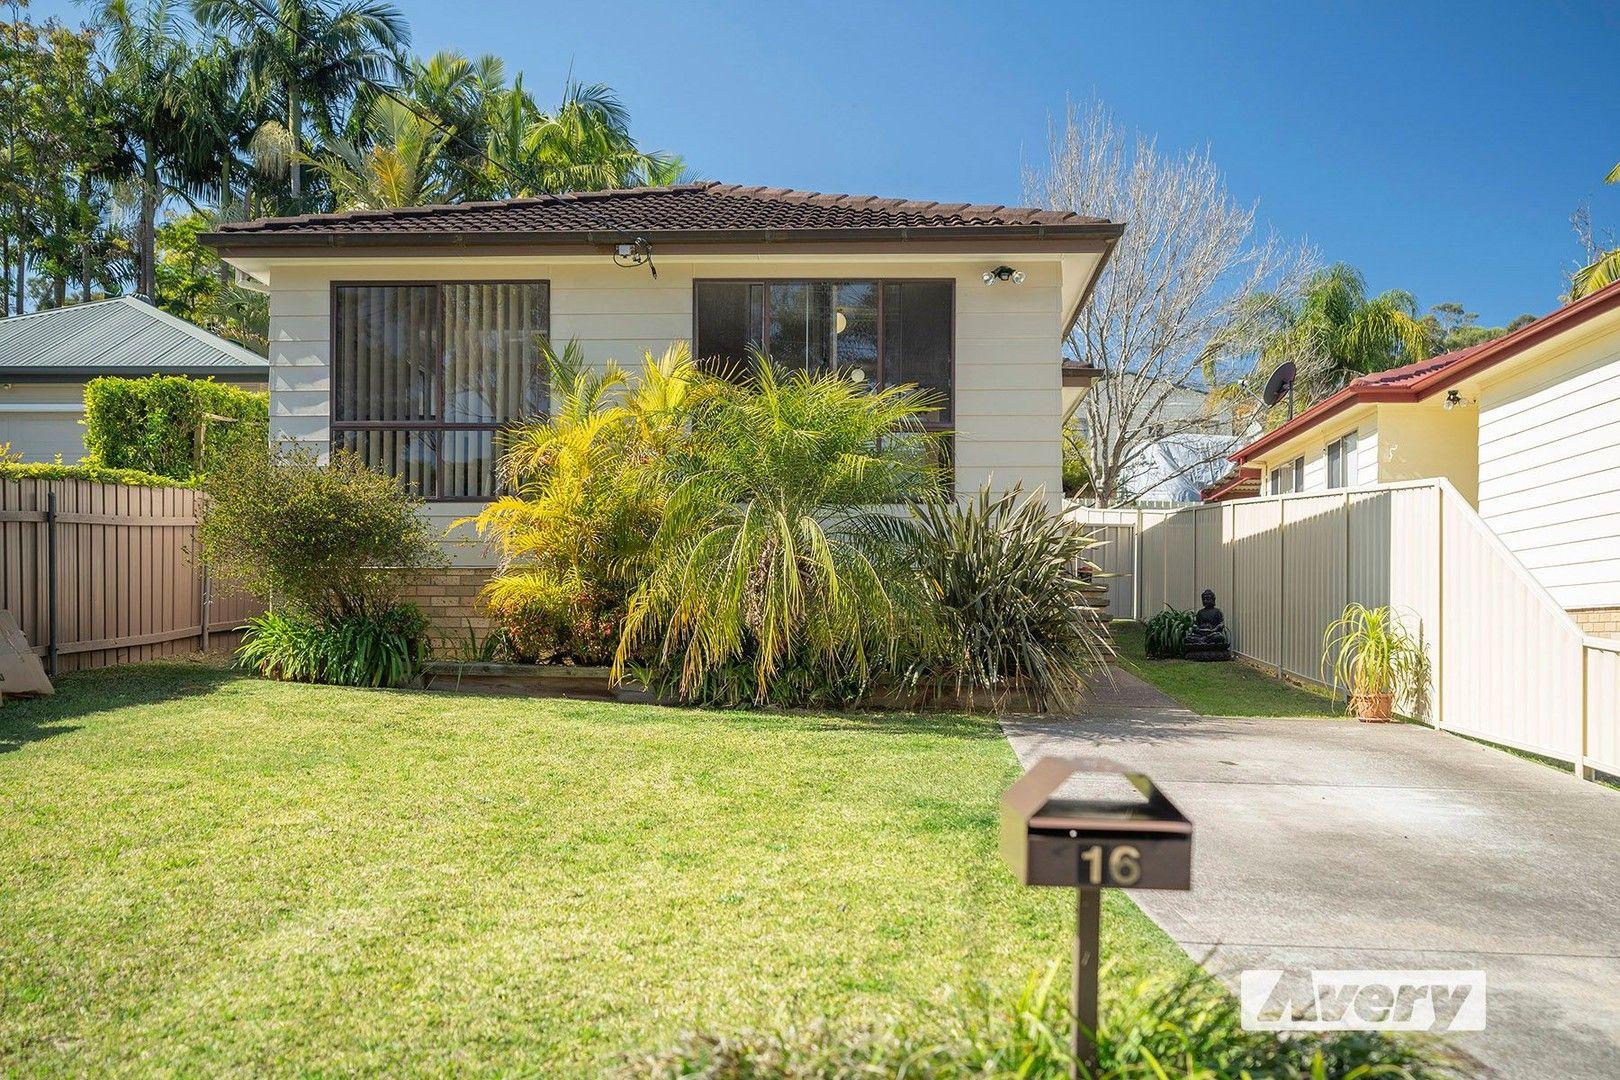 16 Foyle Street, Blackalls Park NSW 2283, Image 0